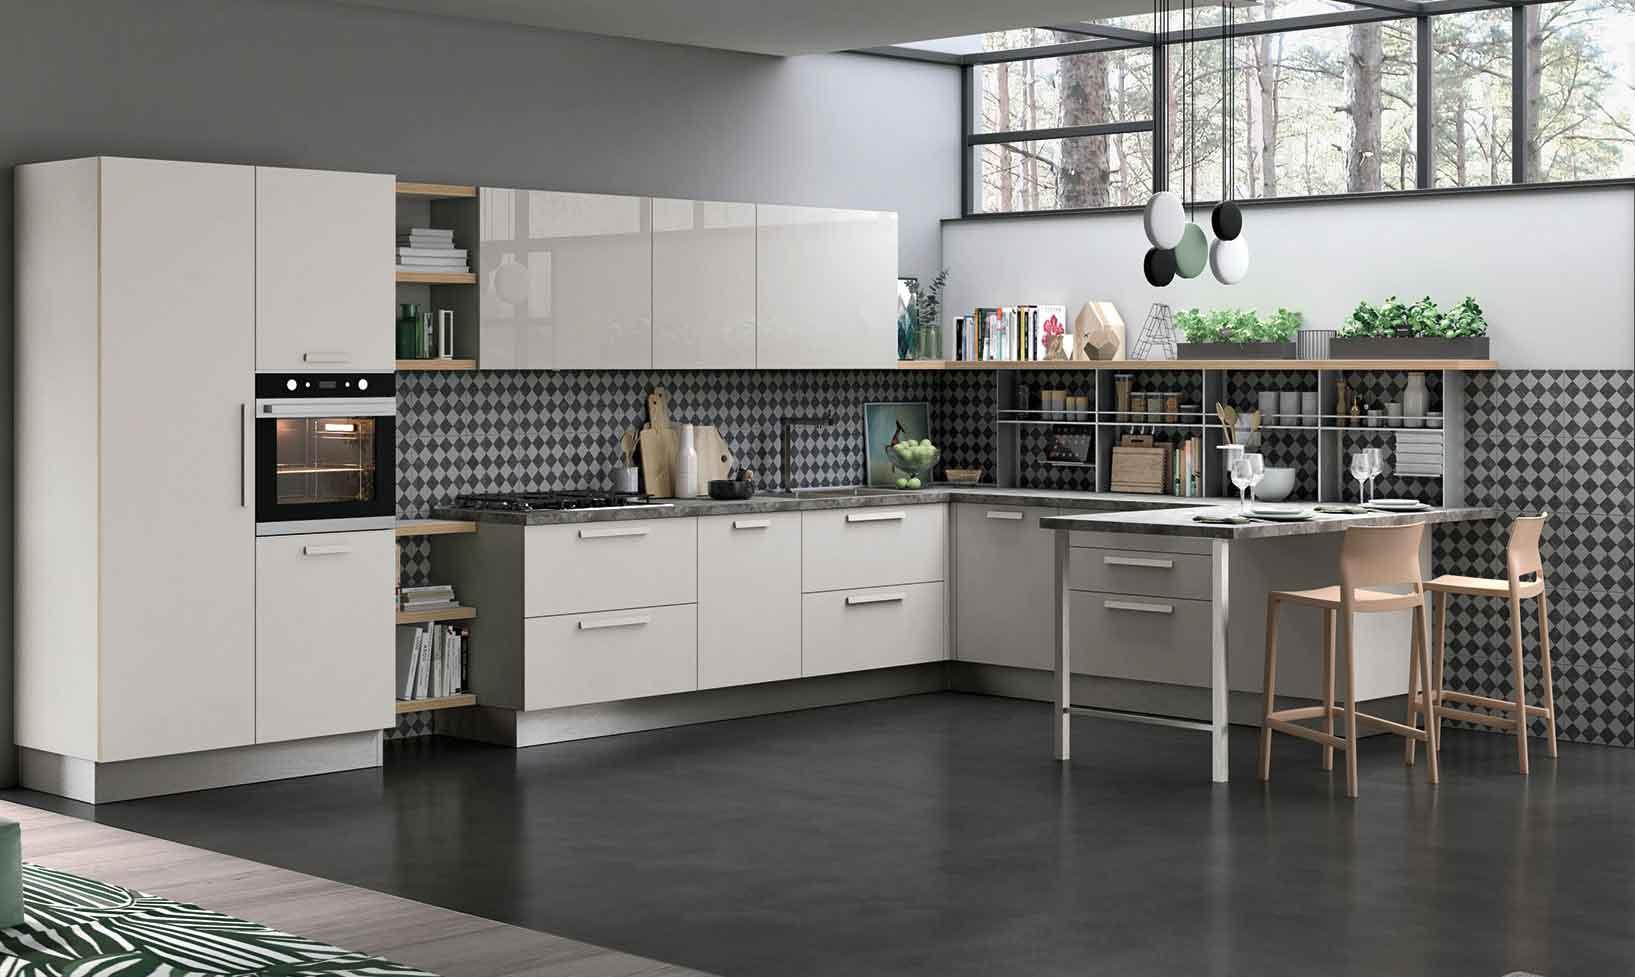 Cucine Creo Lube Opinioni cucina moderna - creo tablet - standard - cucinarredi